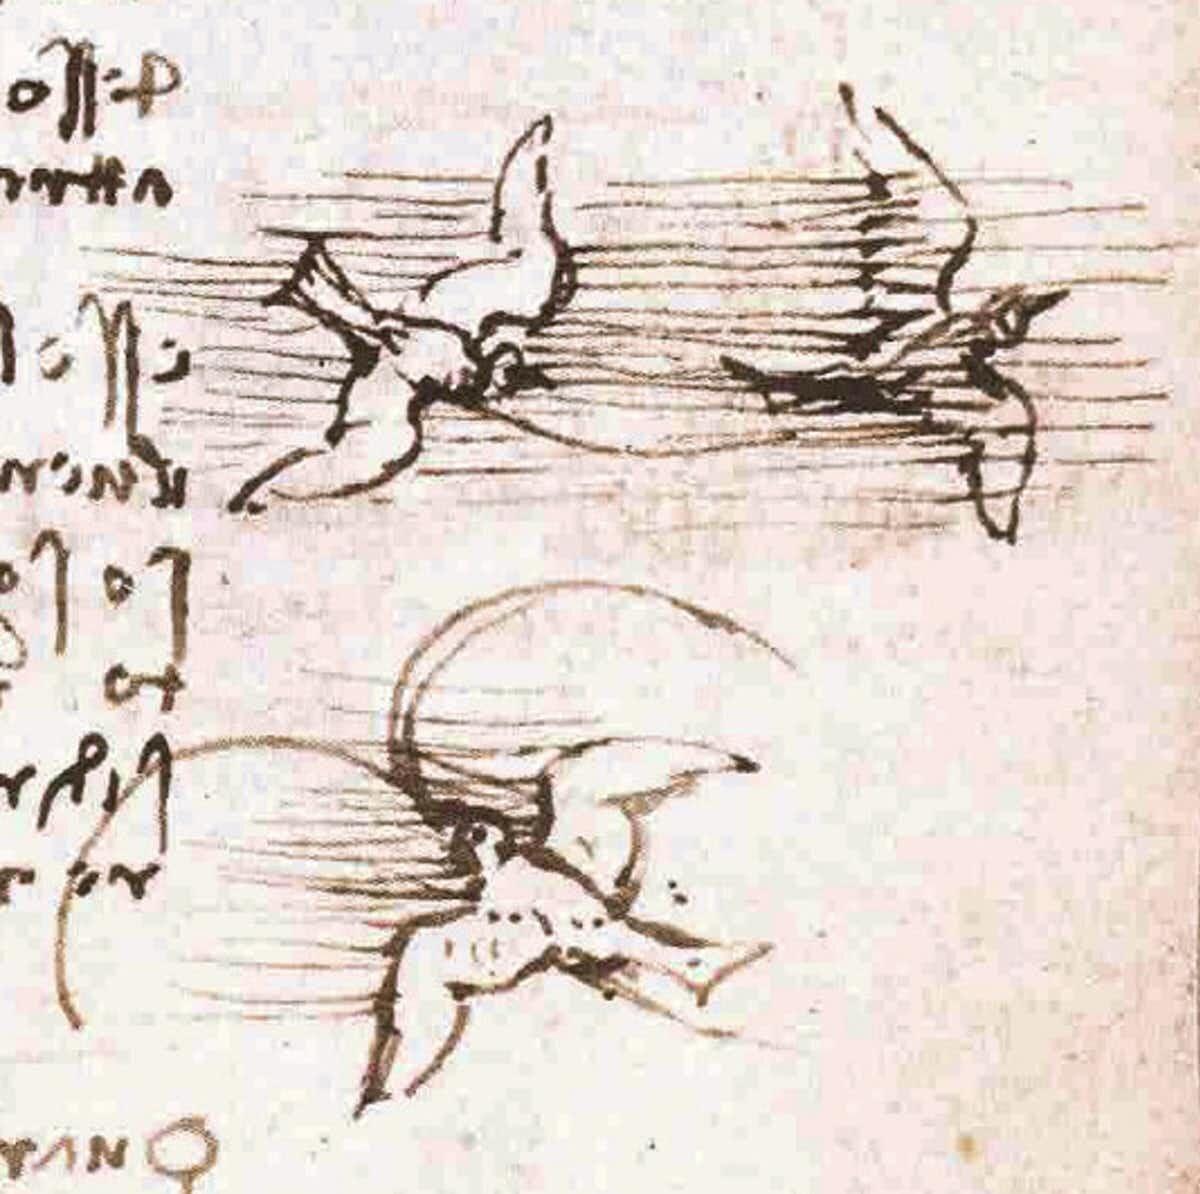 Birds sketched by Leonardo da Vinci. Image via Wikimedia Commons.